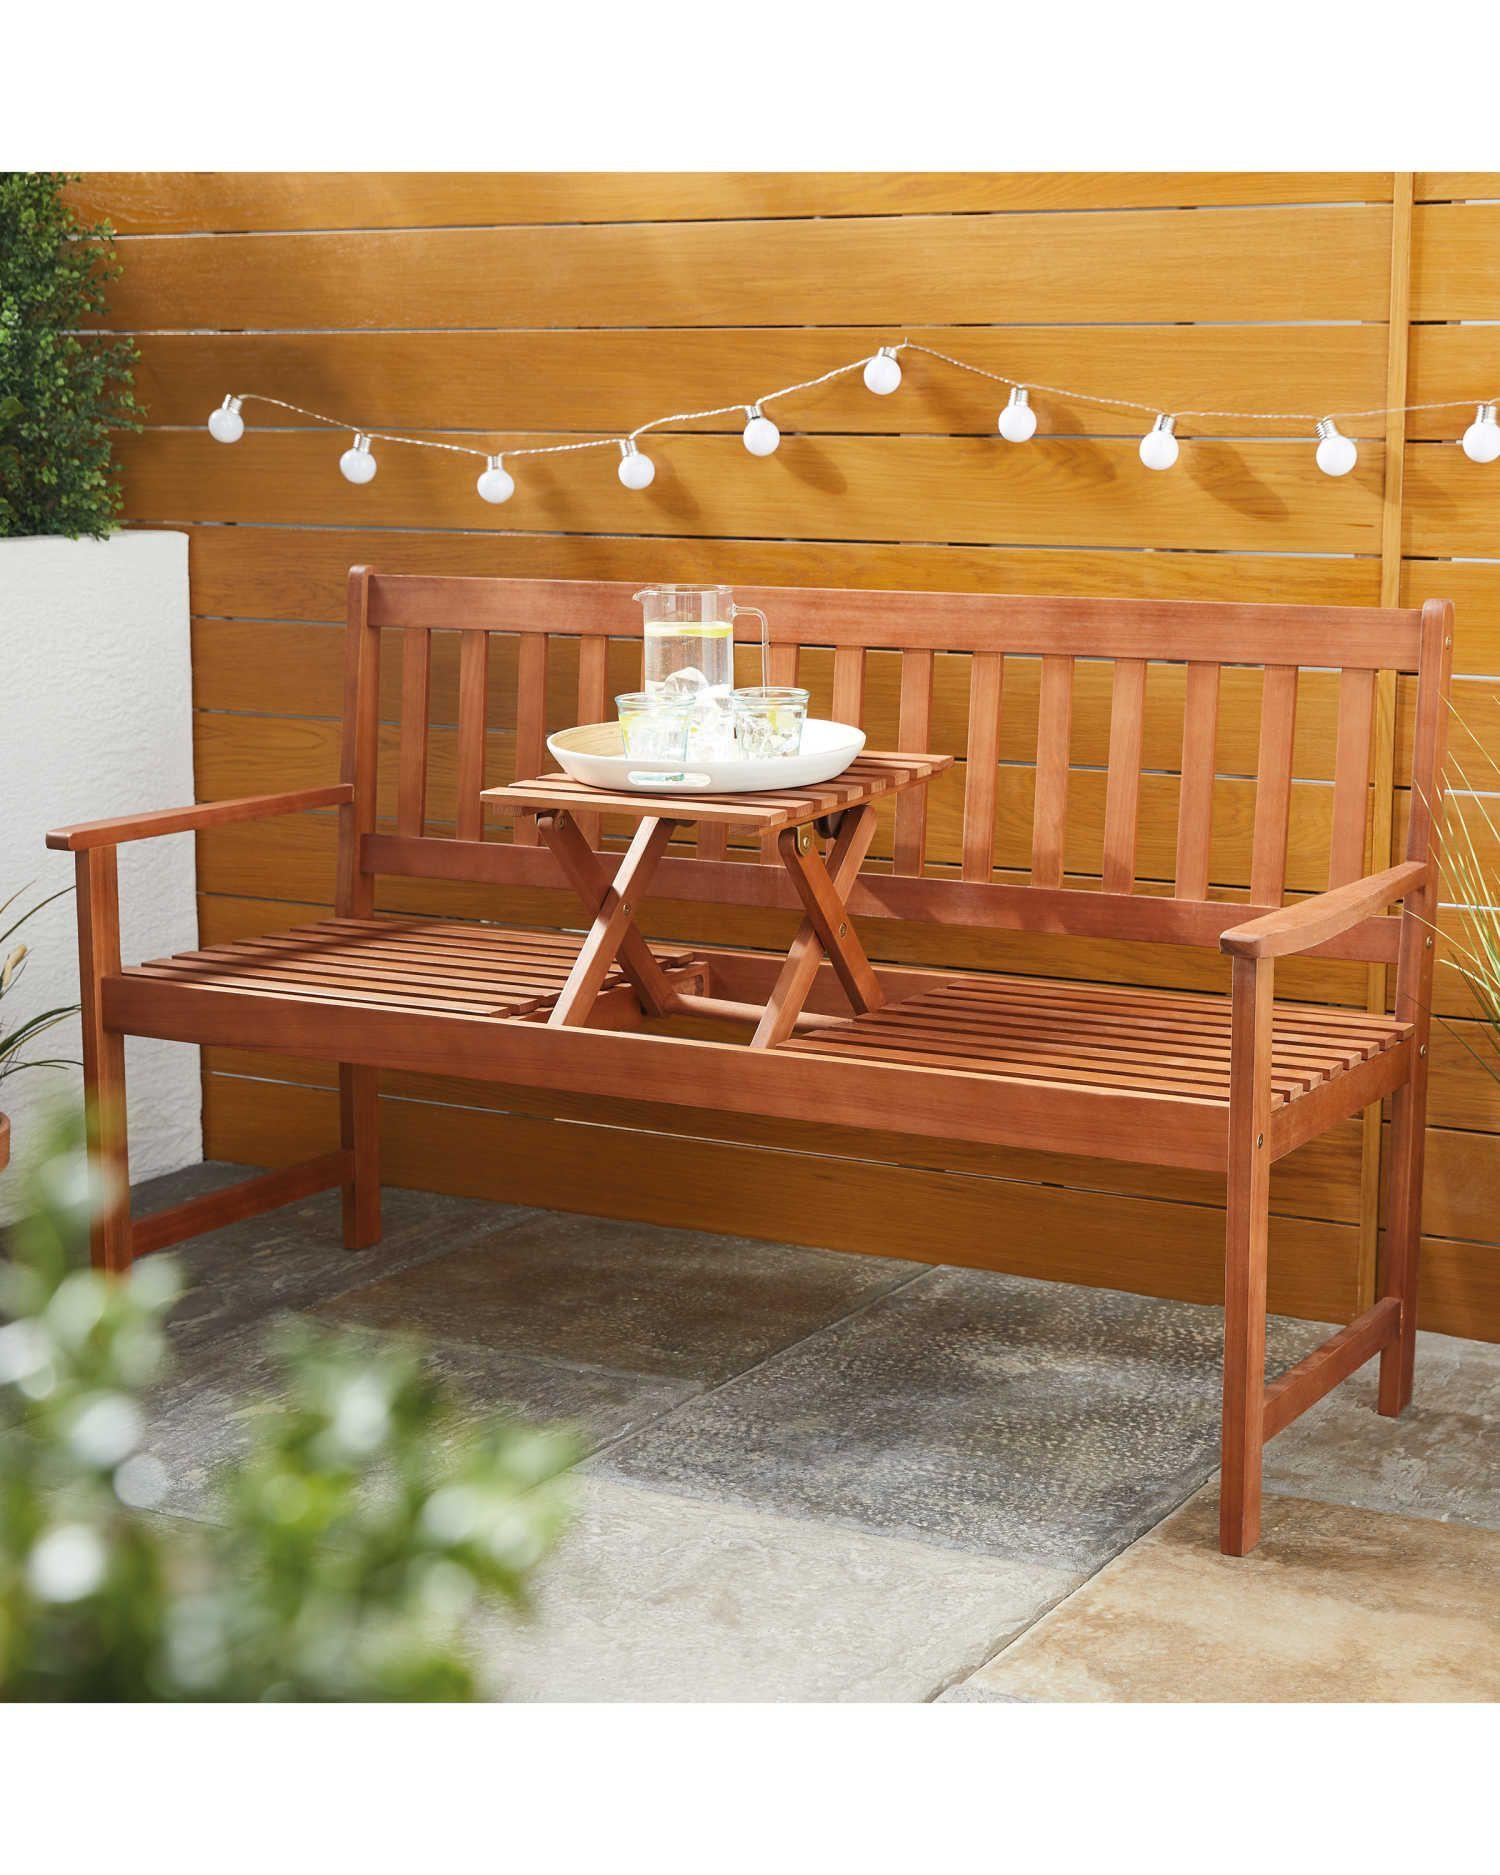 New Aldi Garden Furniture For Outdoor Spaces: Aldi Special Offers